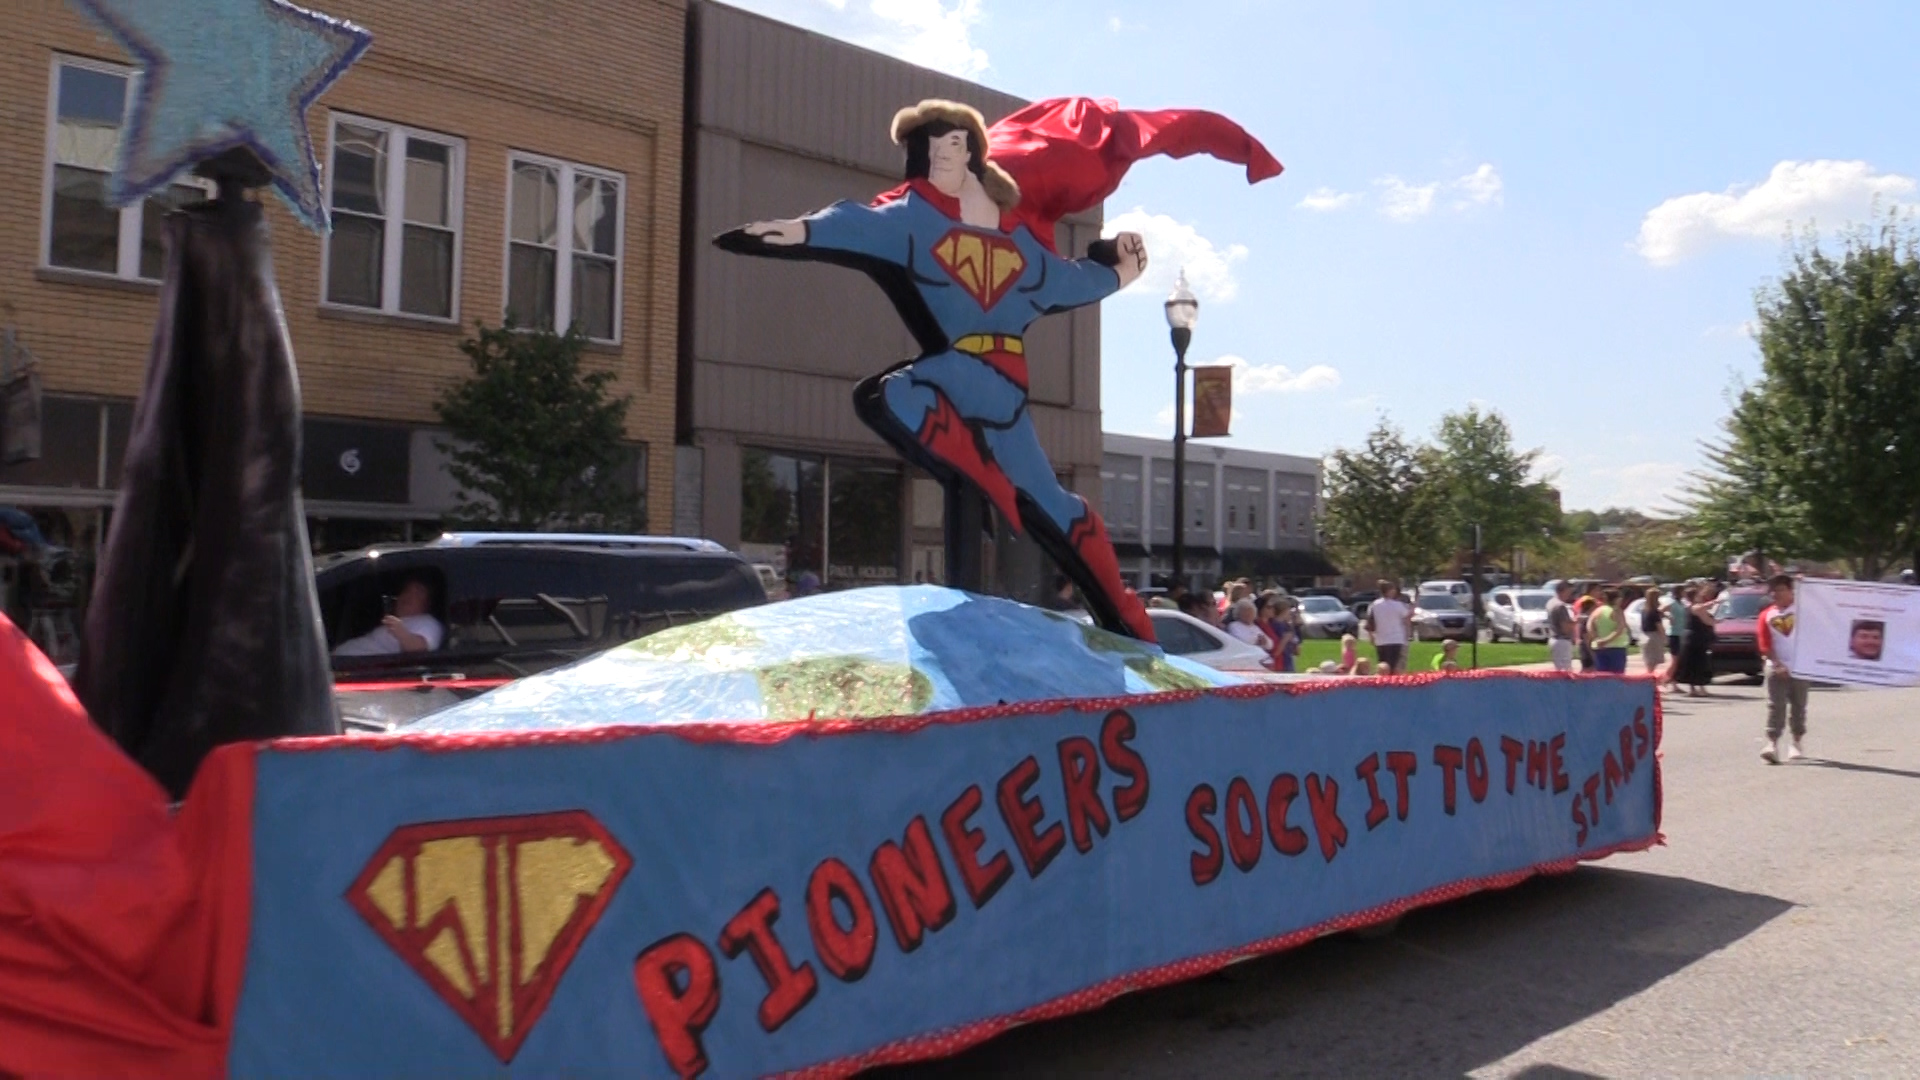 VIDEO - Pioneer homecoming parade